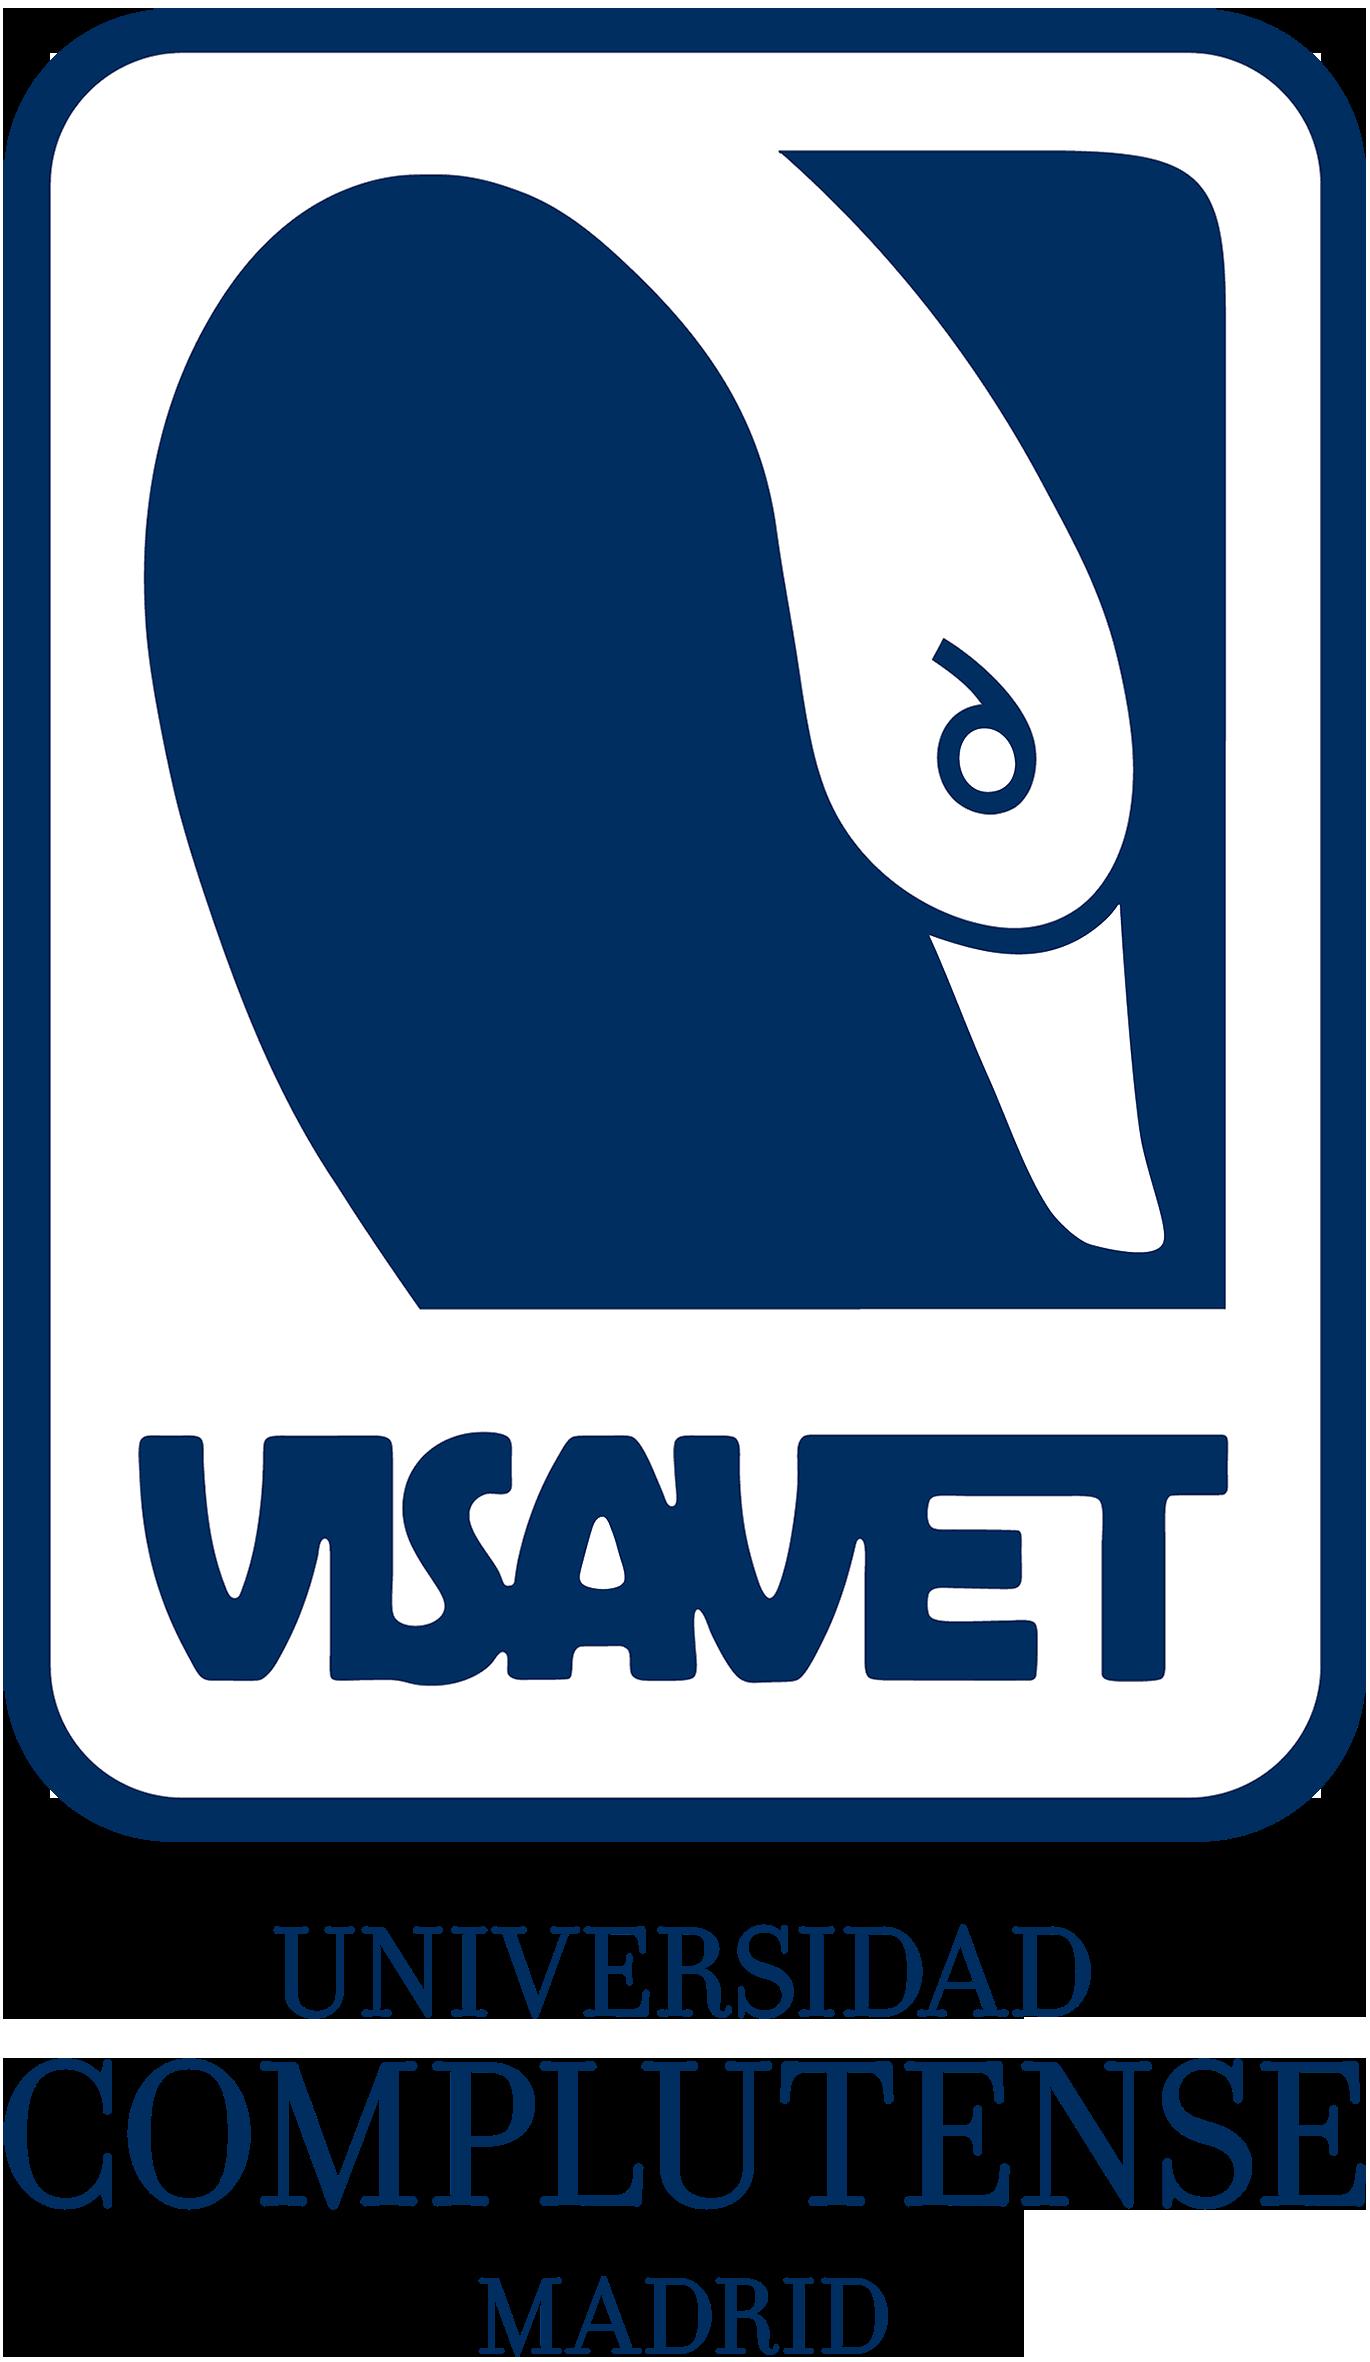 About Visavet